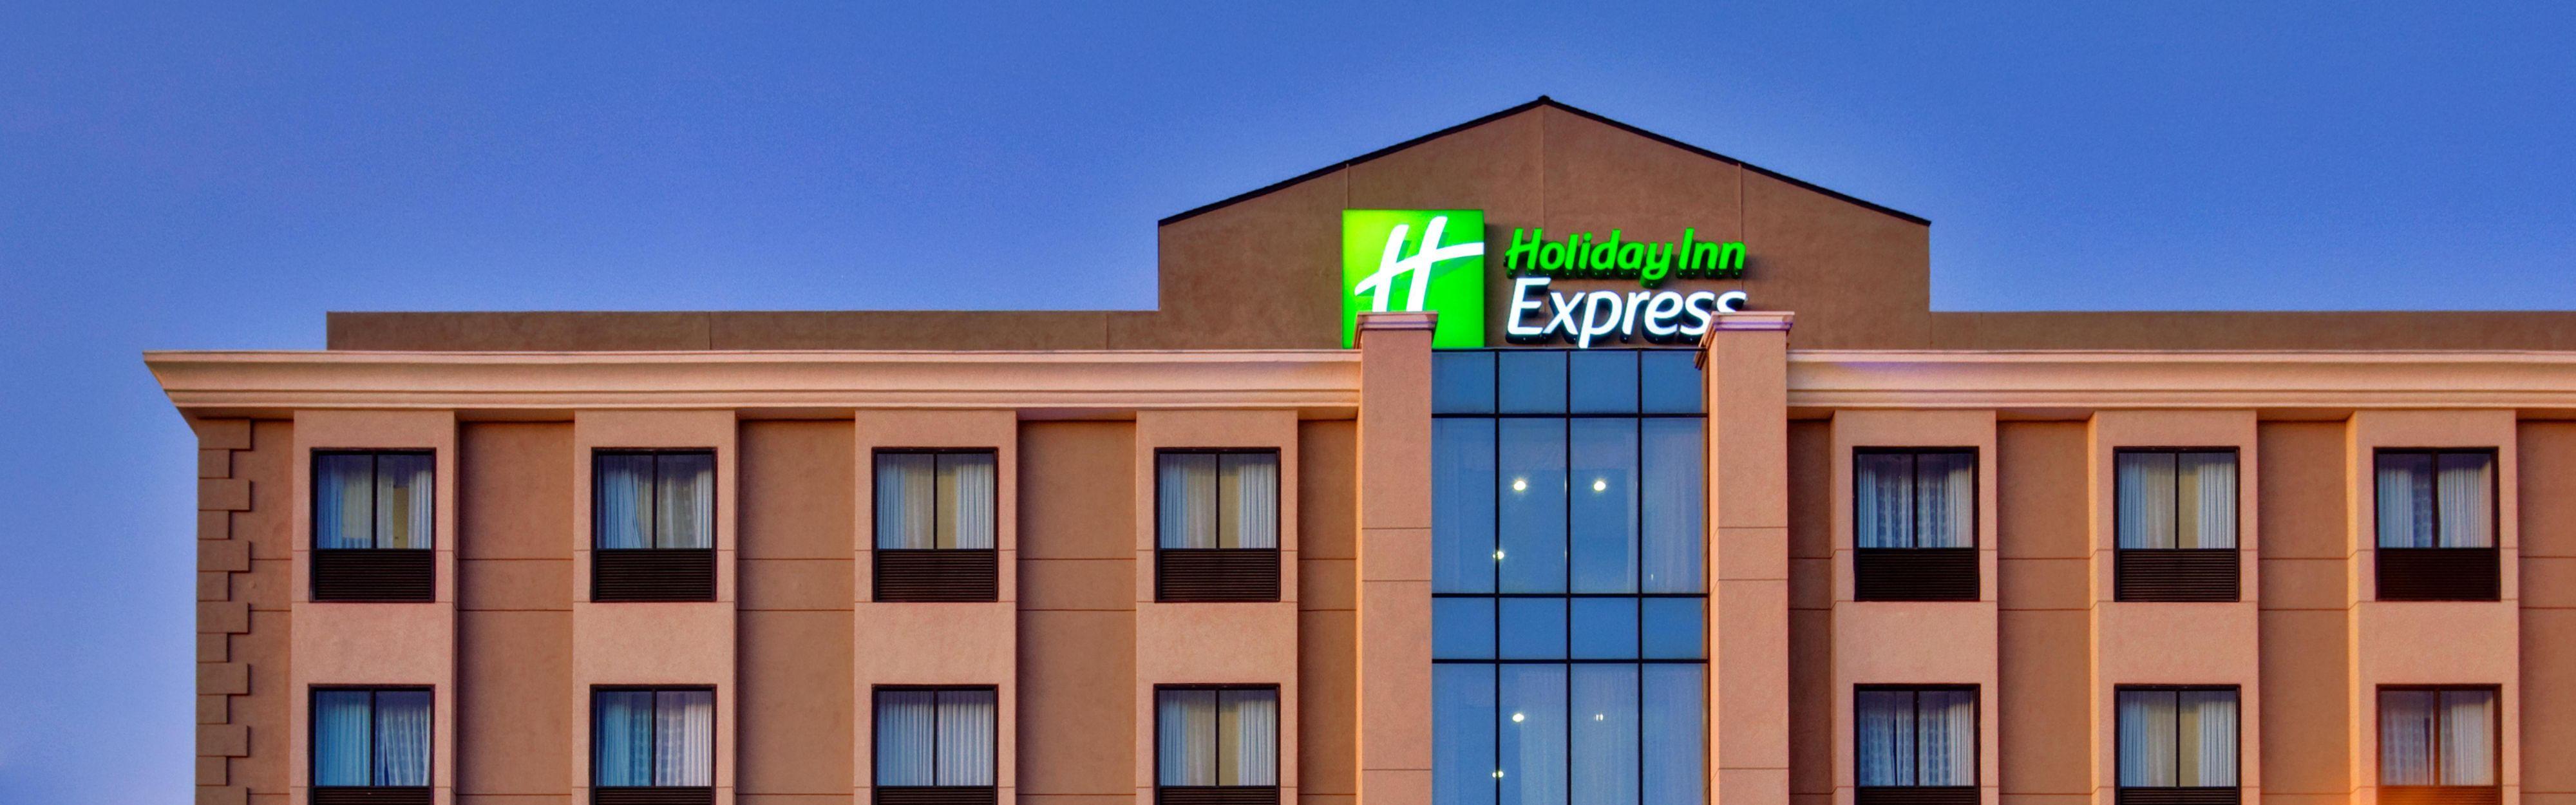 Holiday Inn Express Los Angeles - LAX Airport image 0